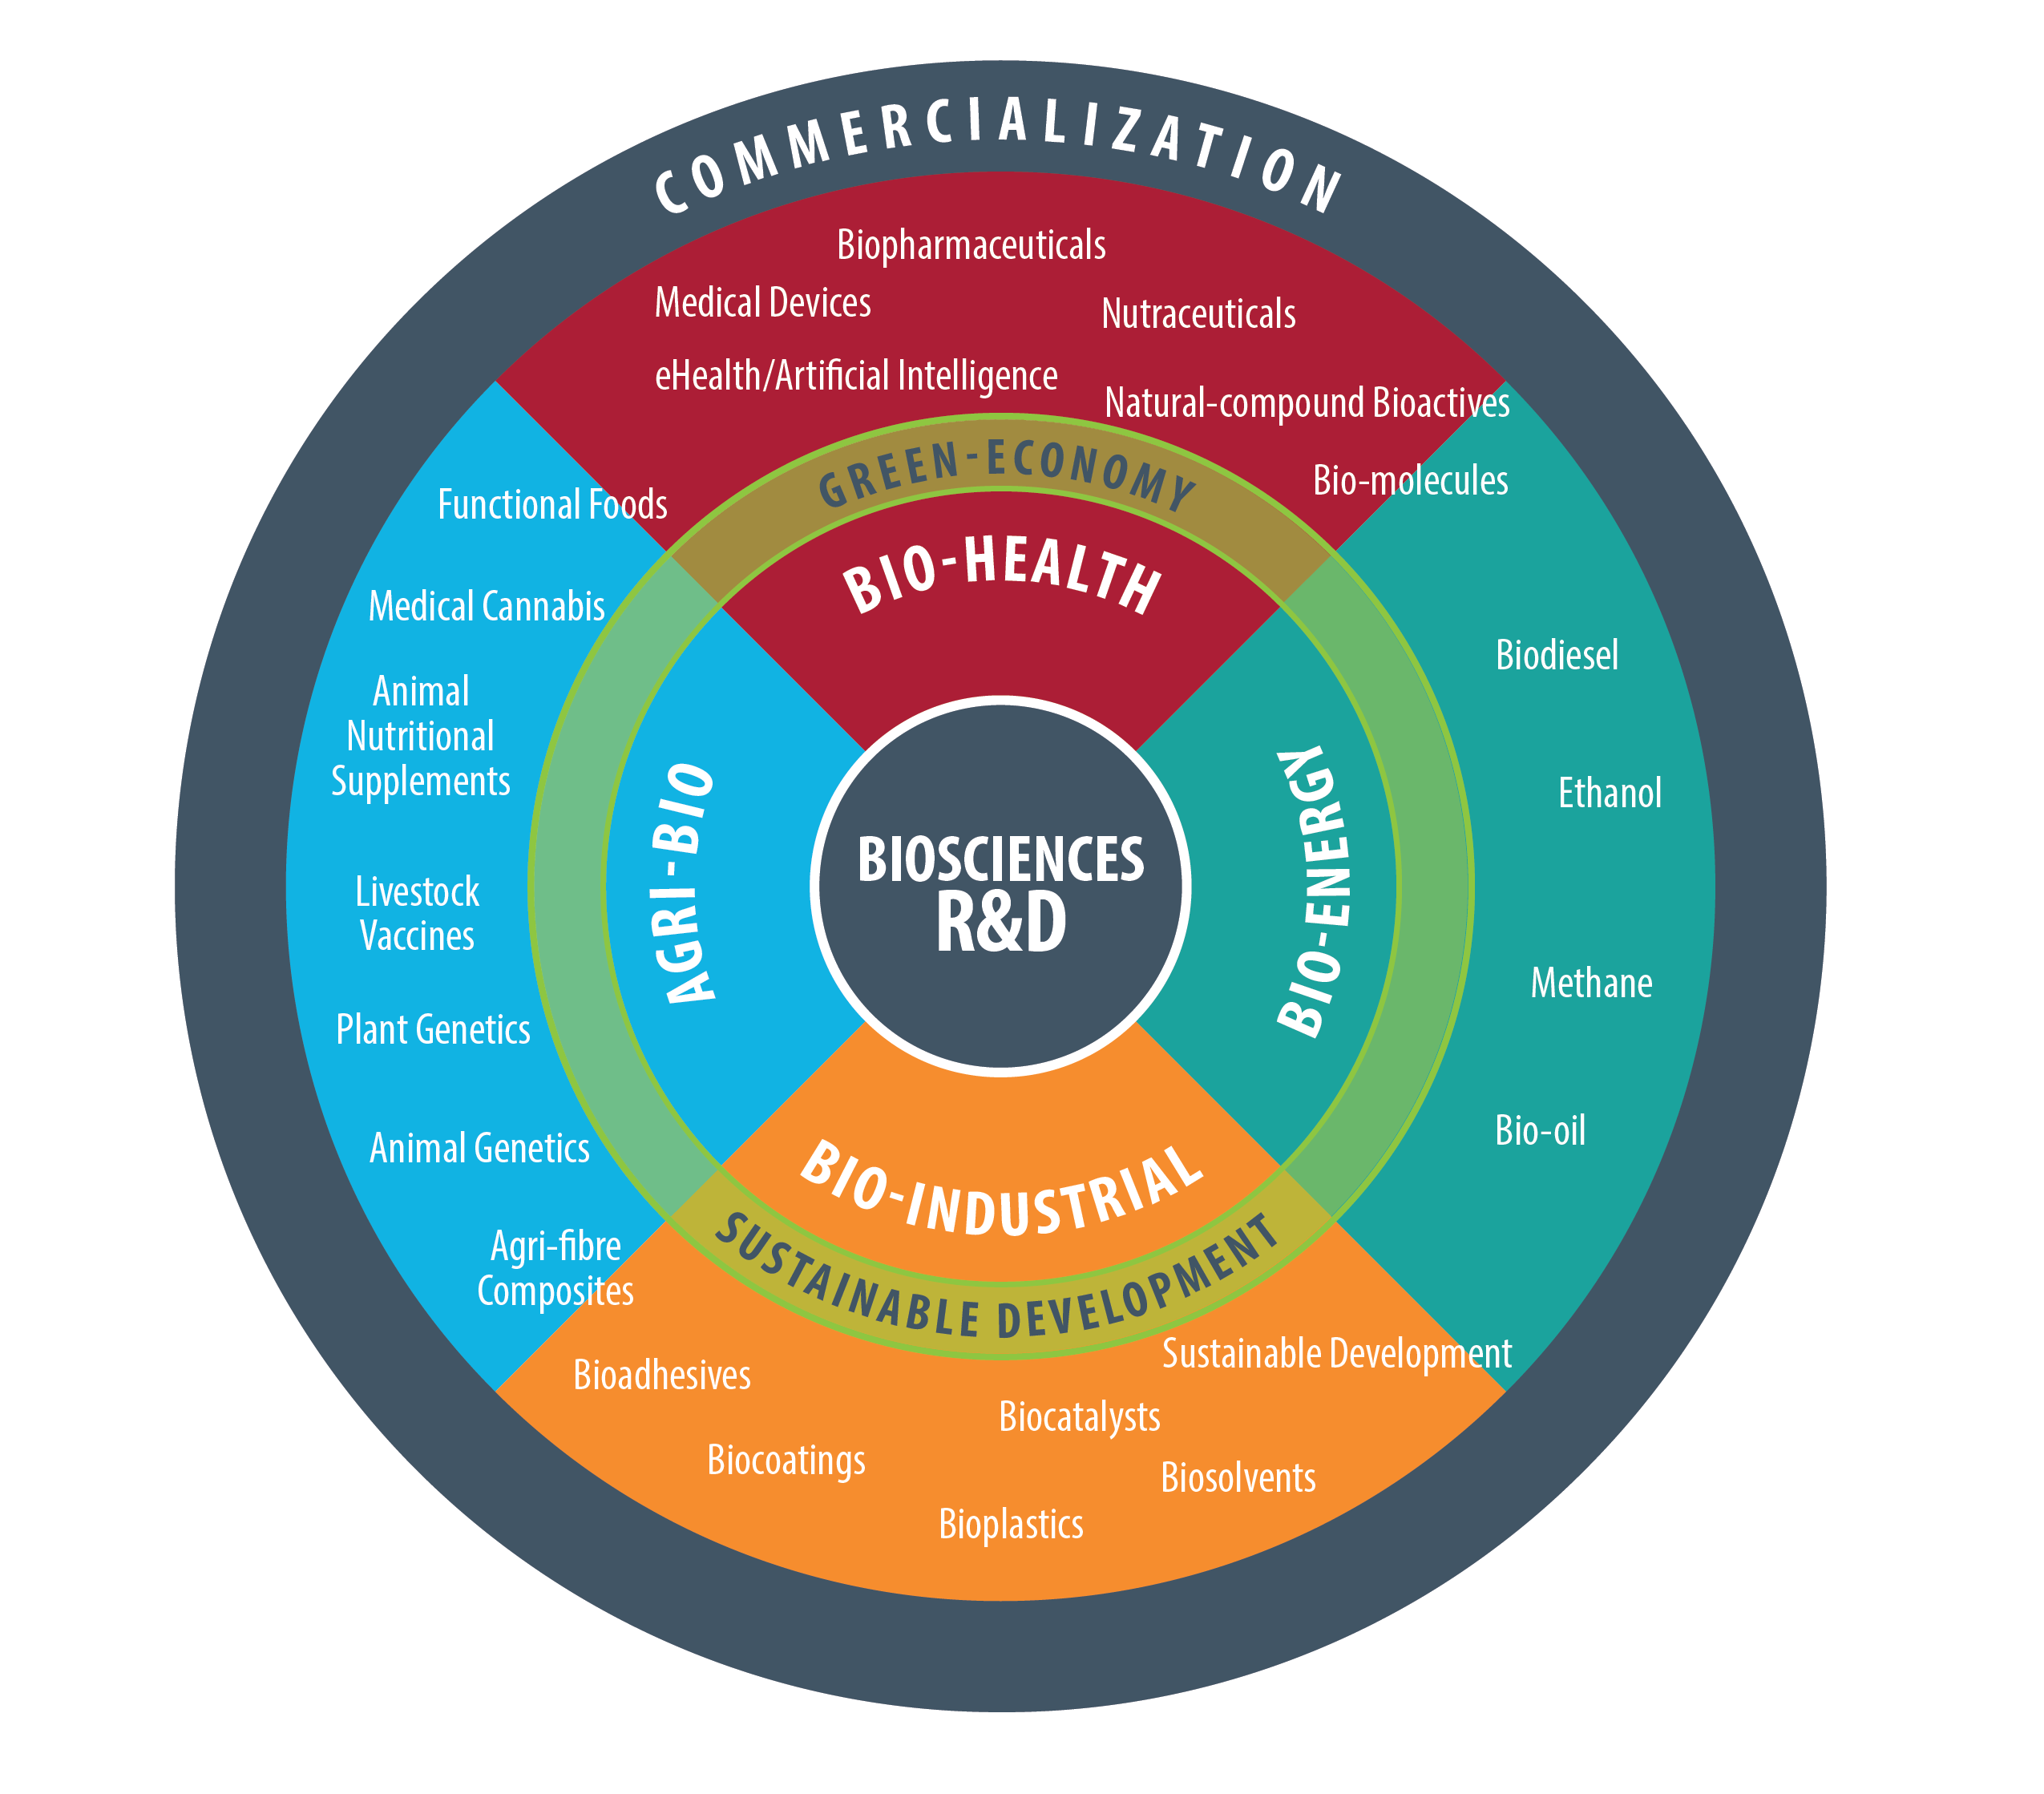 bio-economy wheel showing sectors breakdown, shown as text below